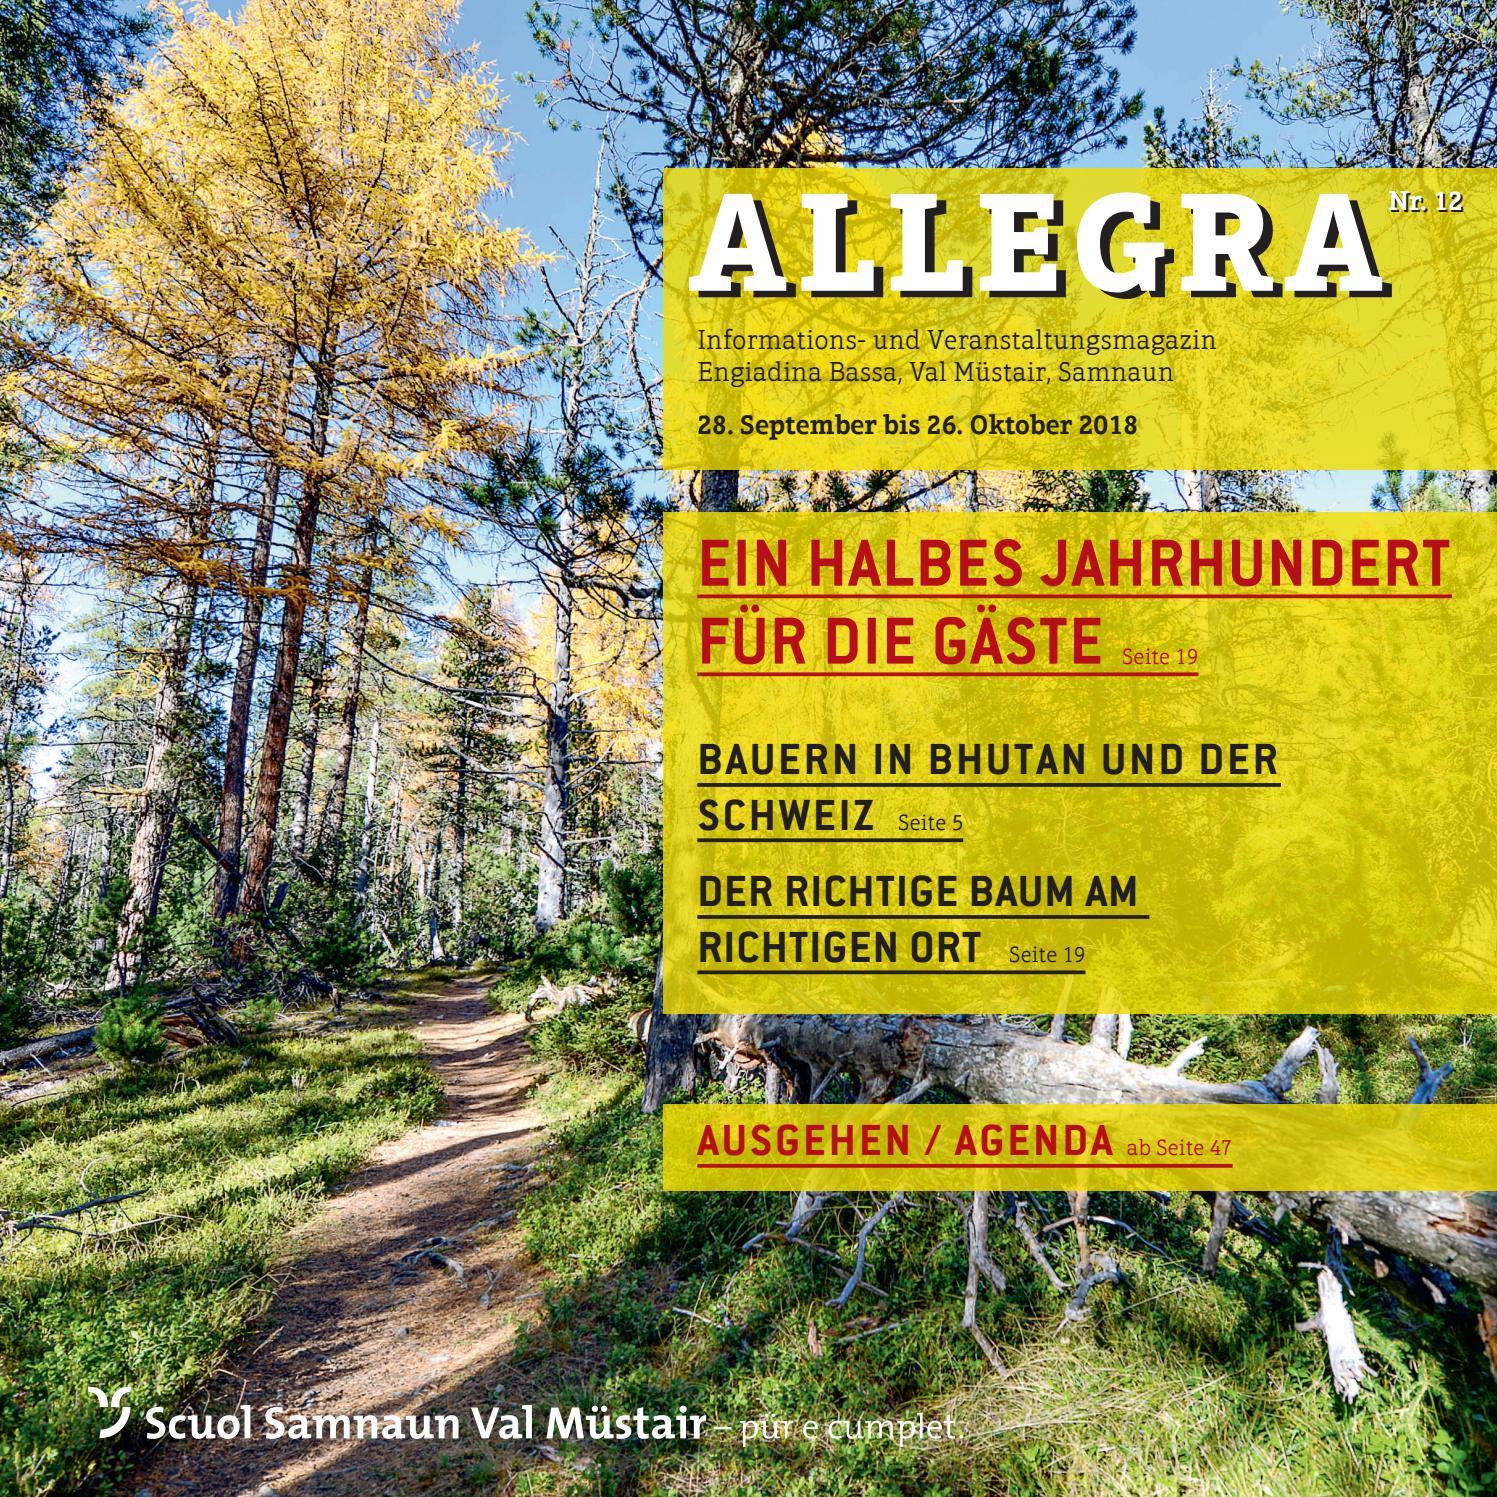 Diskrete Treffen Horben b Illnau, private kontakte Hersberg